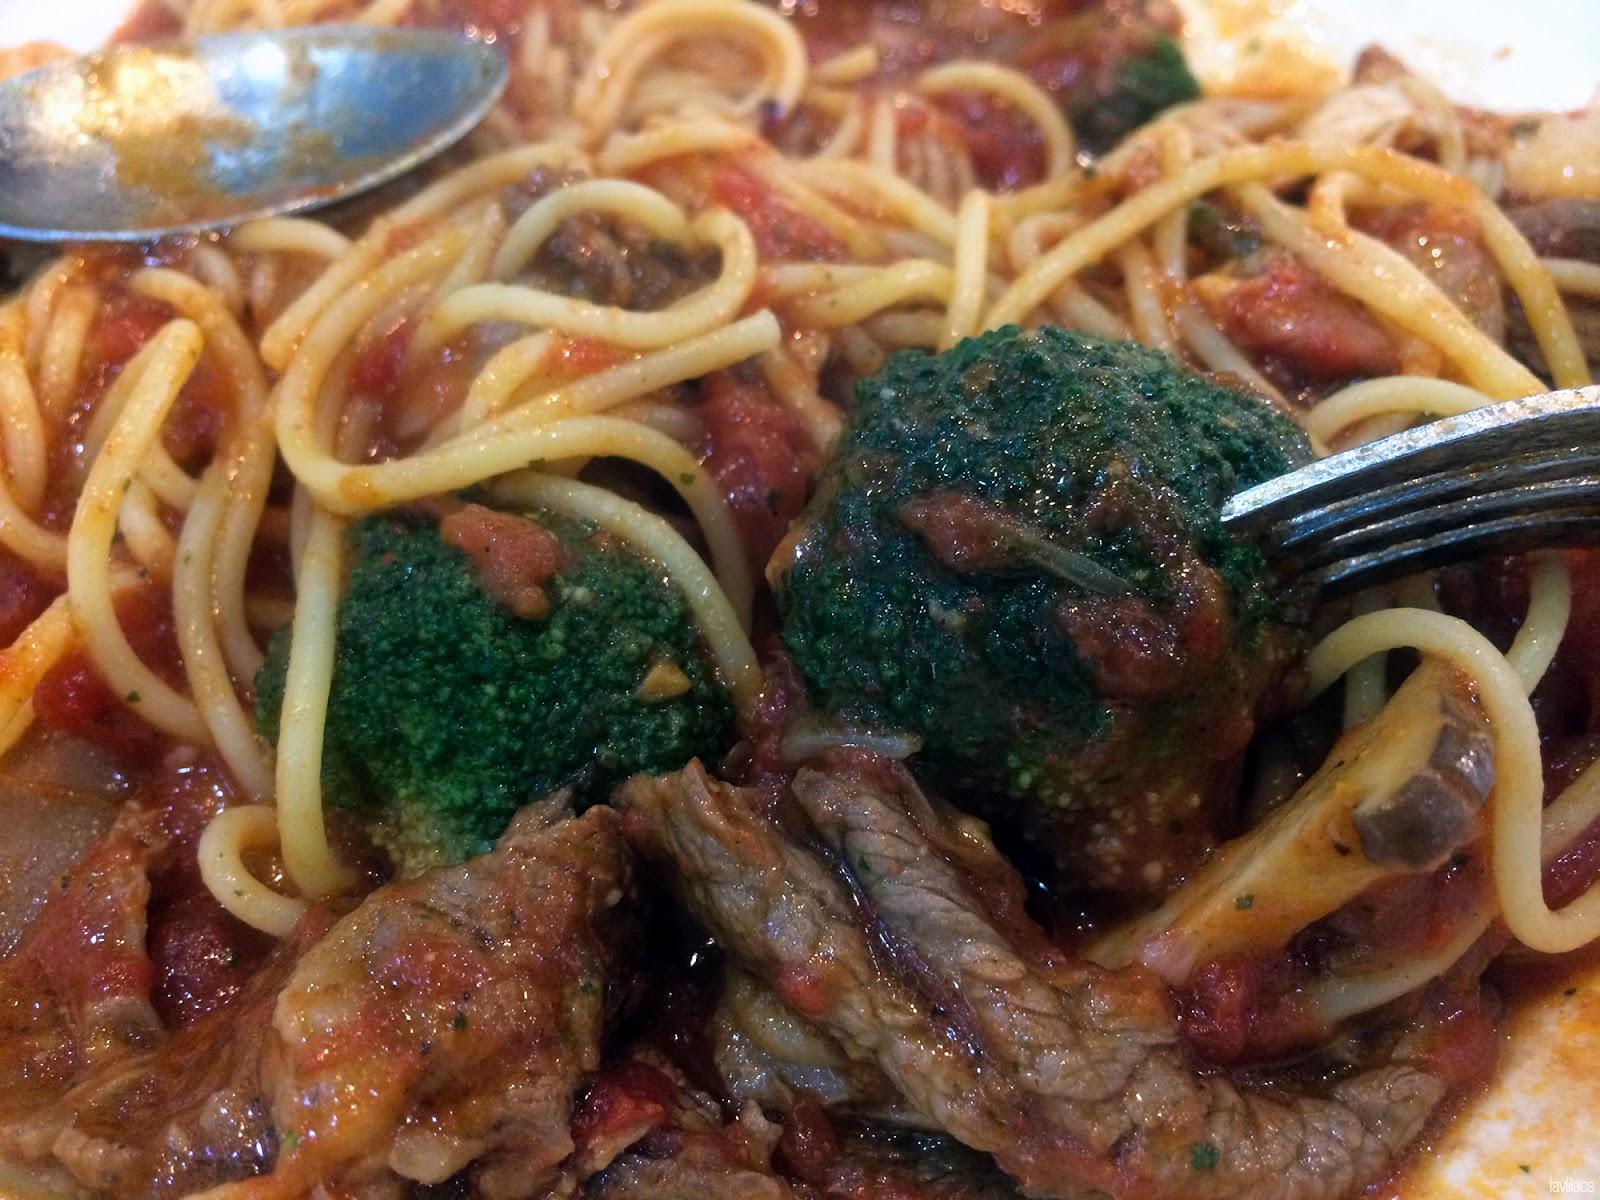 Seoul, Korea - Summer Study Abroad 2014 - Beef spaghetti from cafeteria